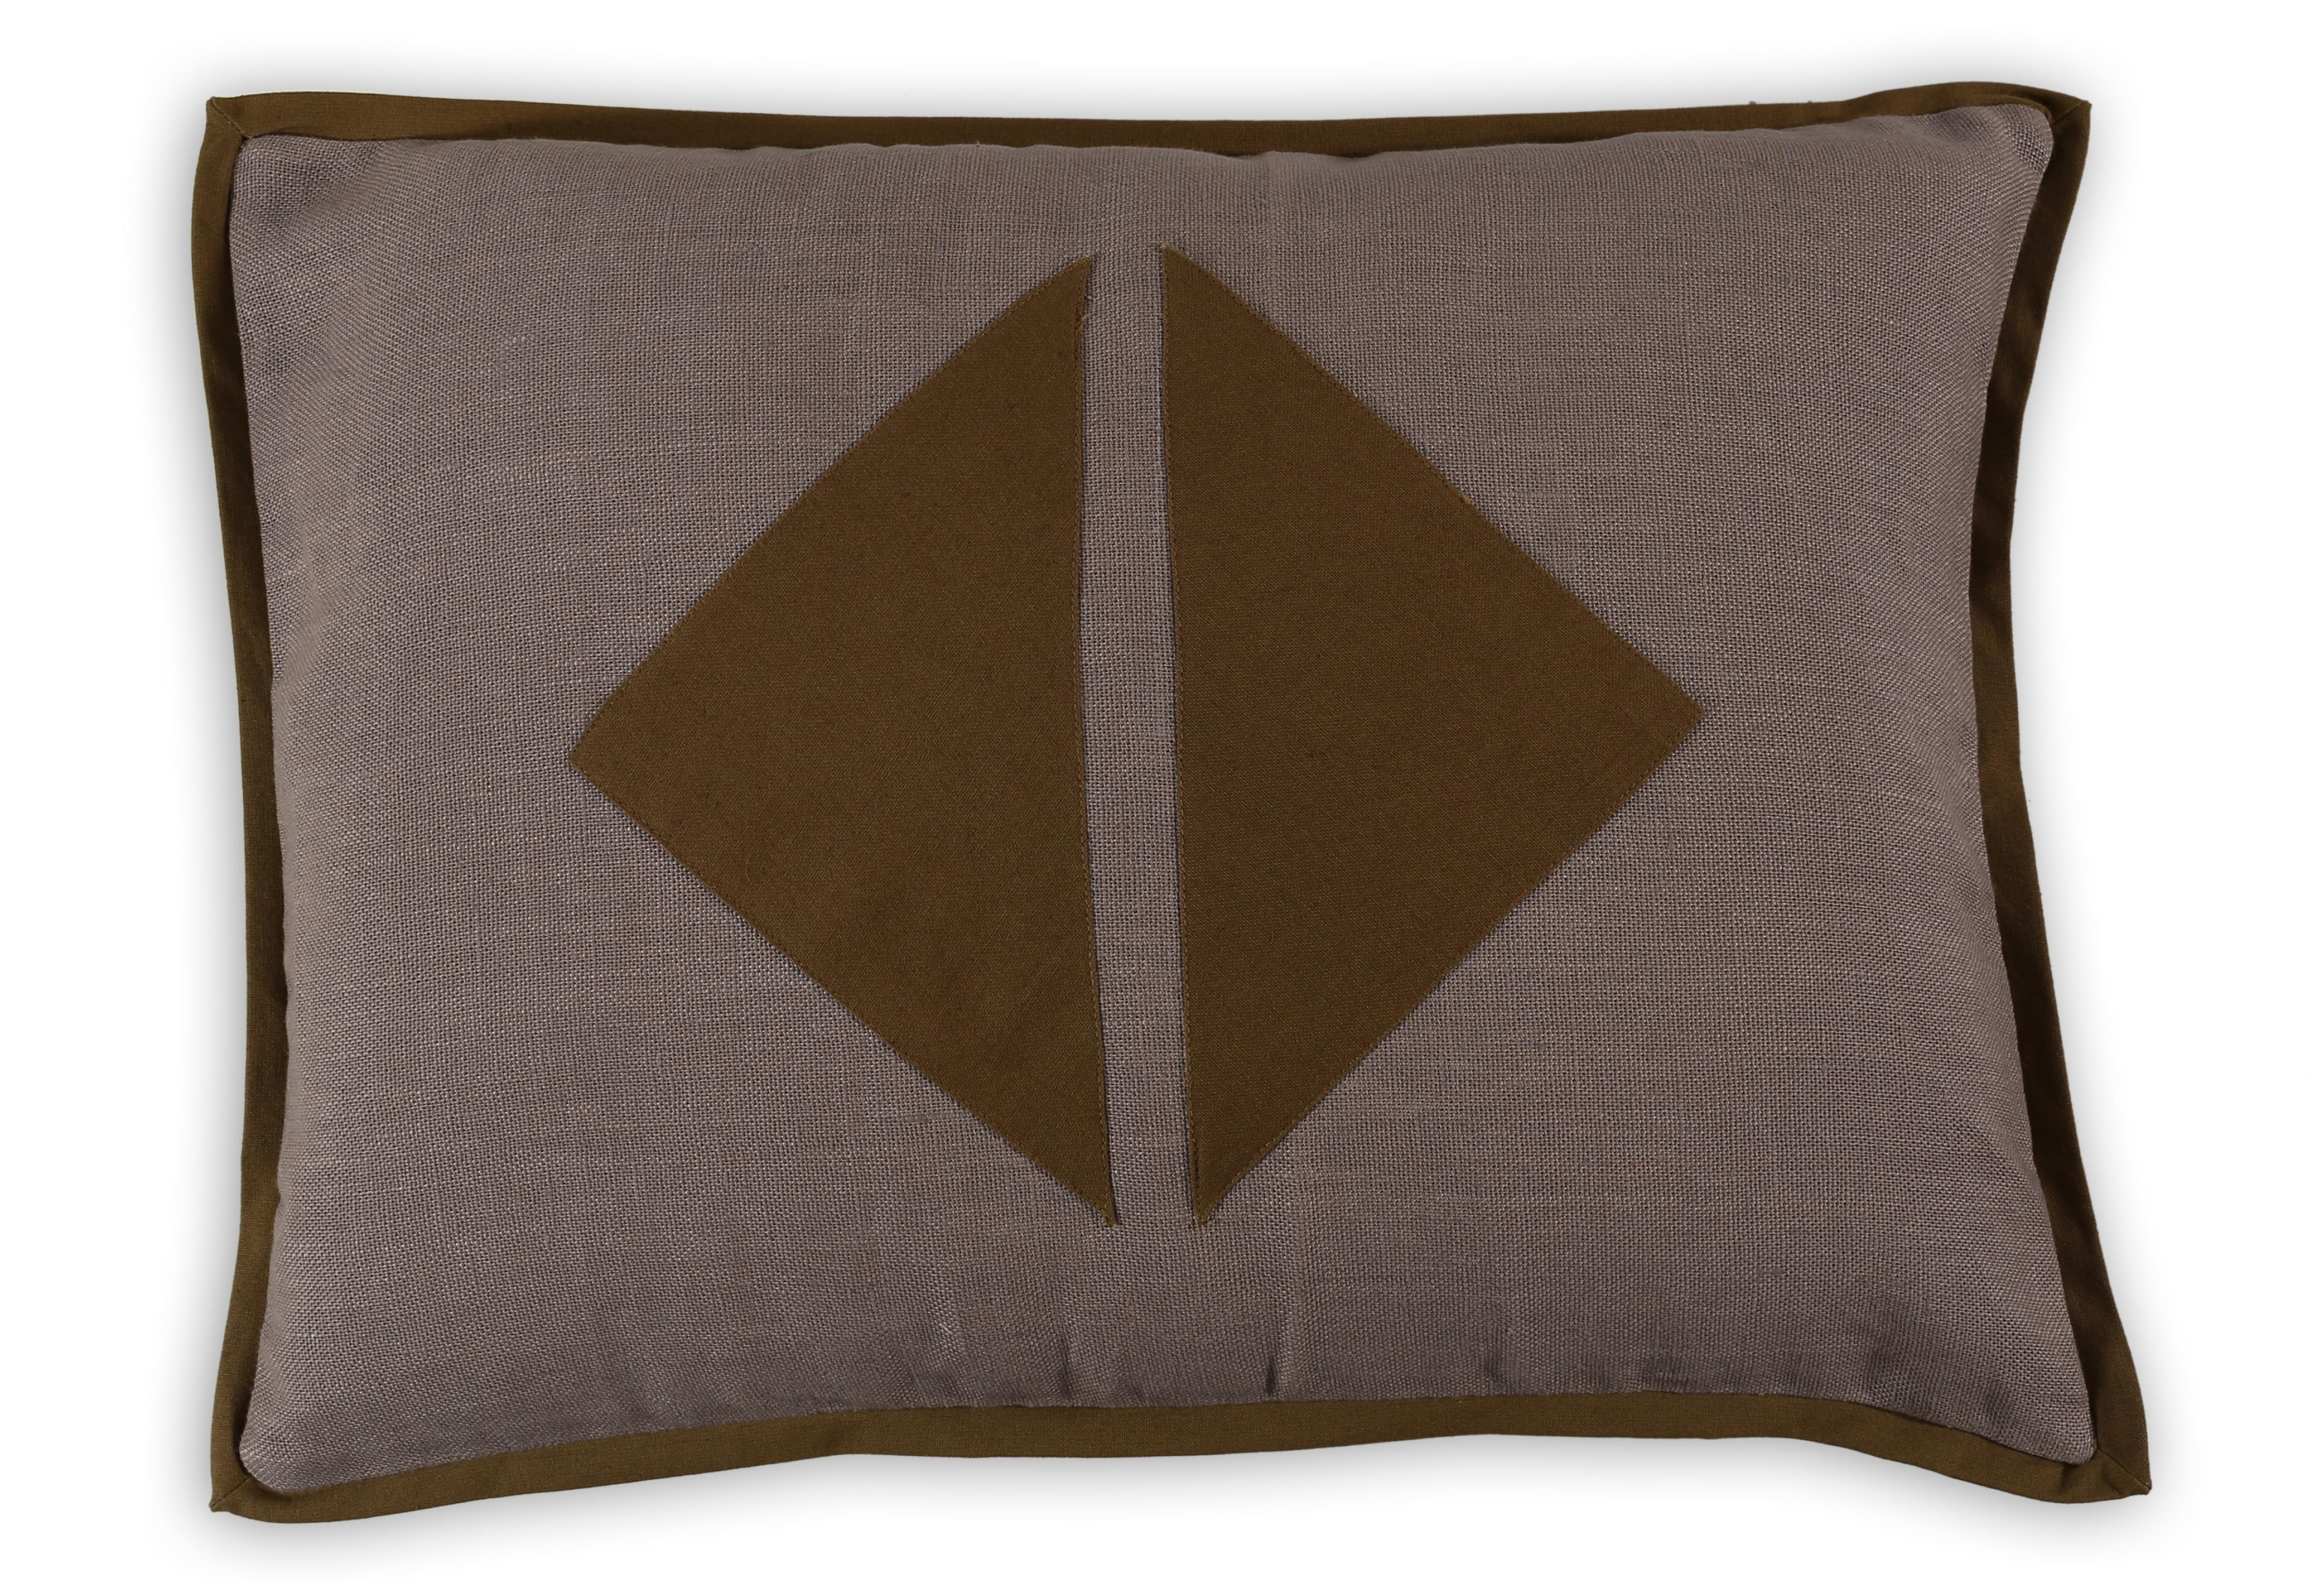 24X24 Pillow Insert Extraordinary Sku 441110 Roscoff Pillow Linencotton Blend 24X24 Inches Feather Design Decoration